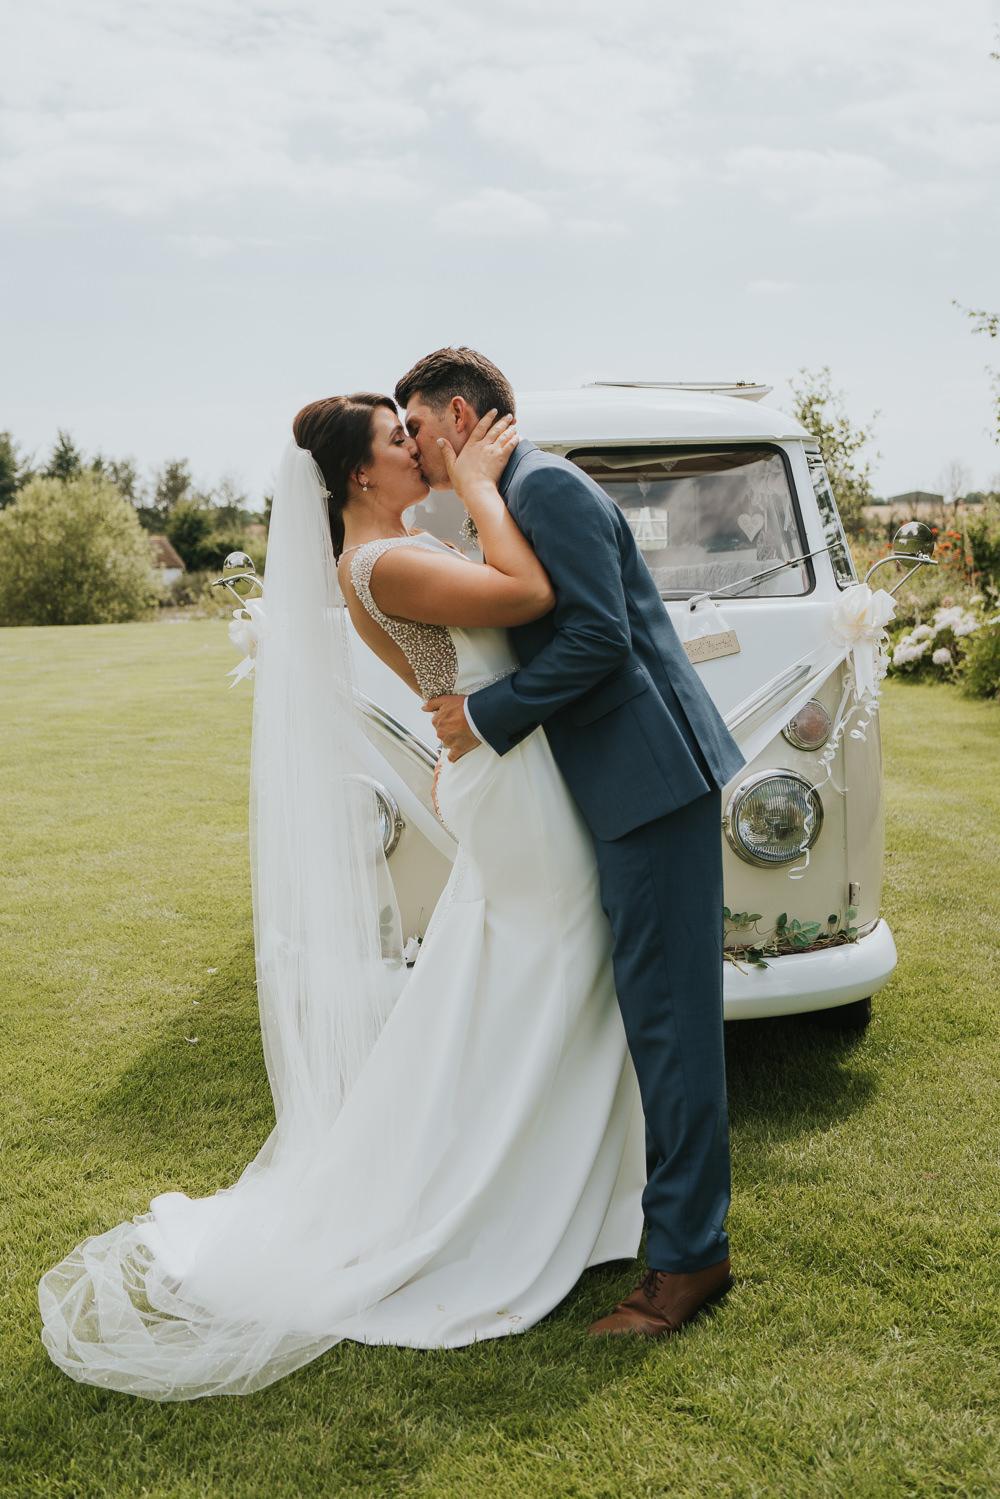 VW Campervan Transport High House Weddings Grace Elizabeth Photography